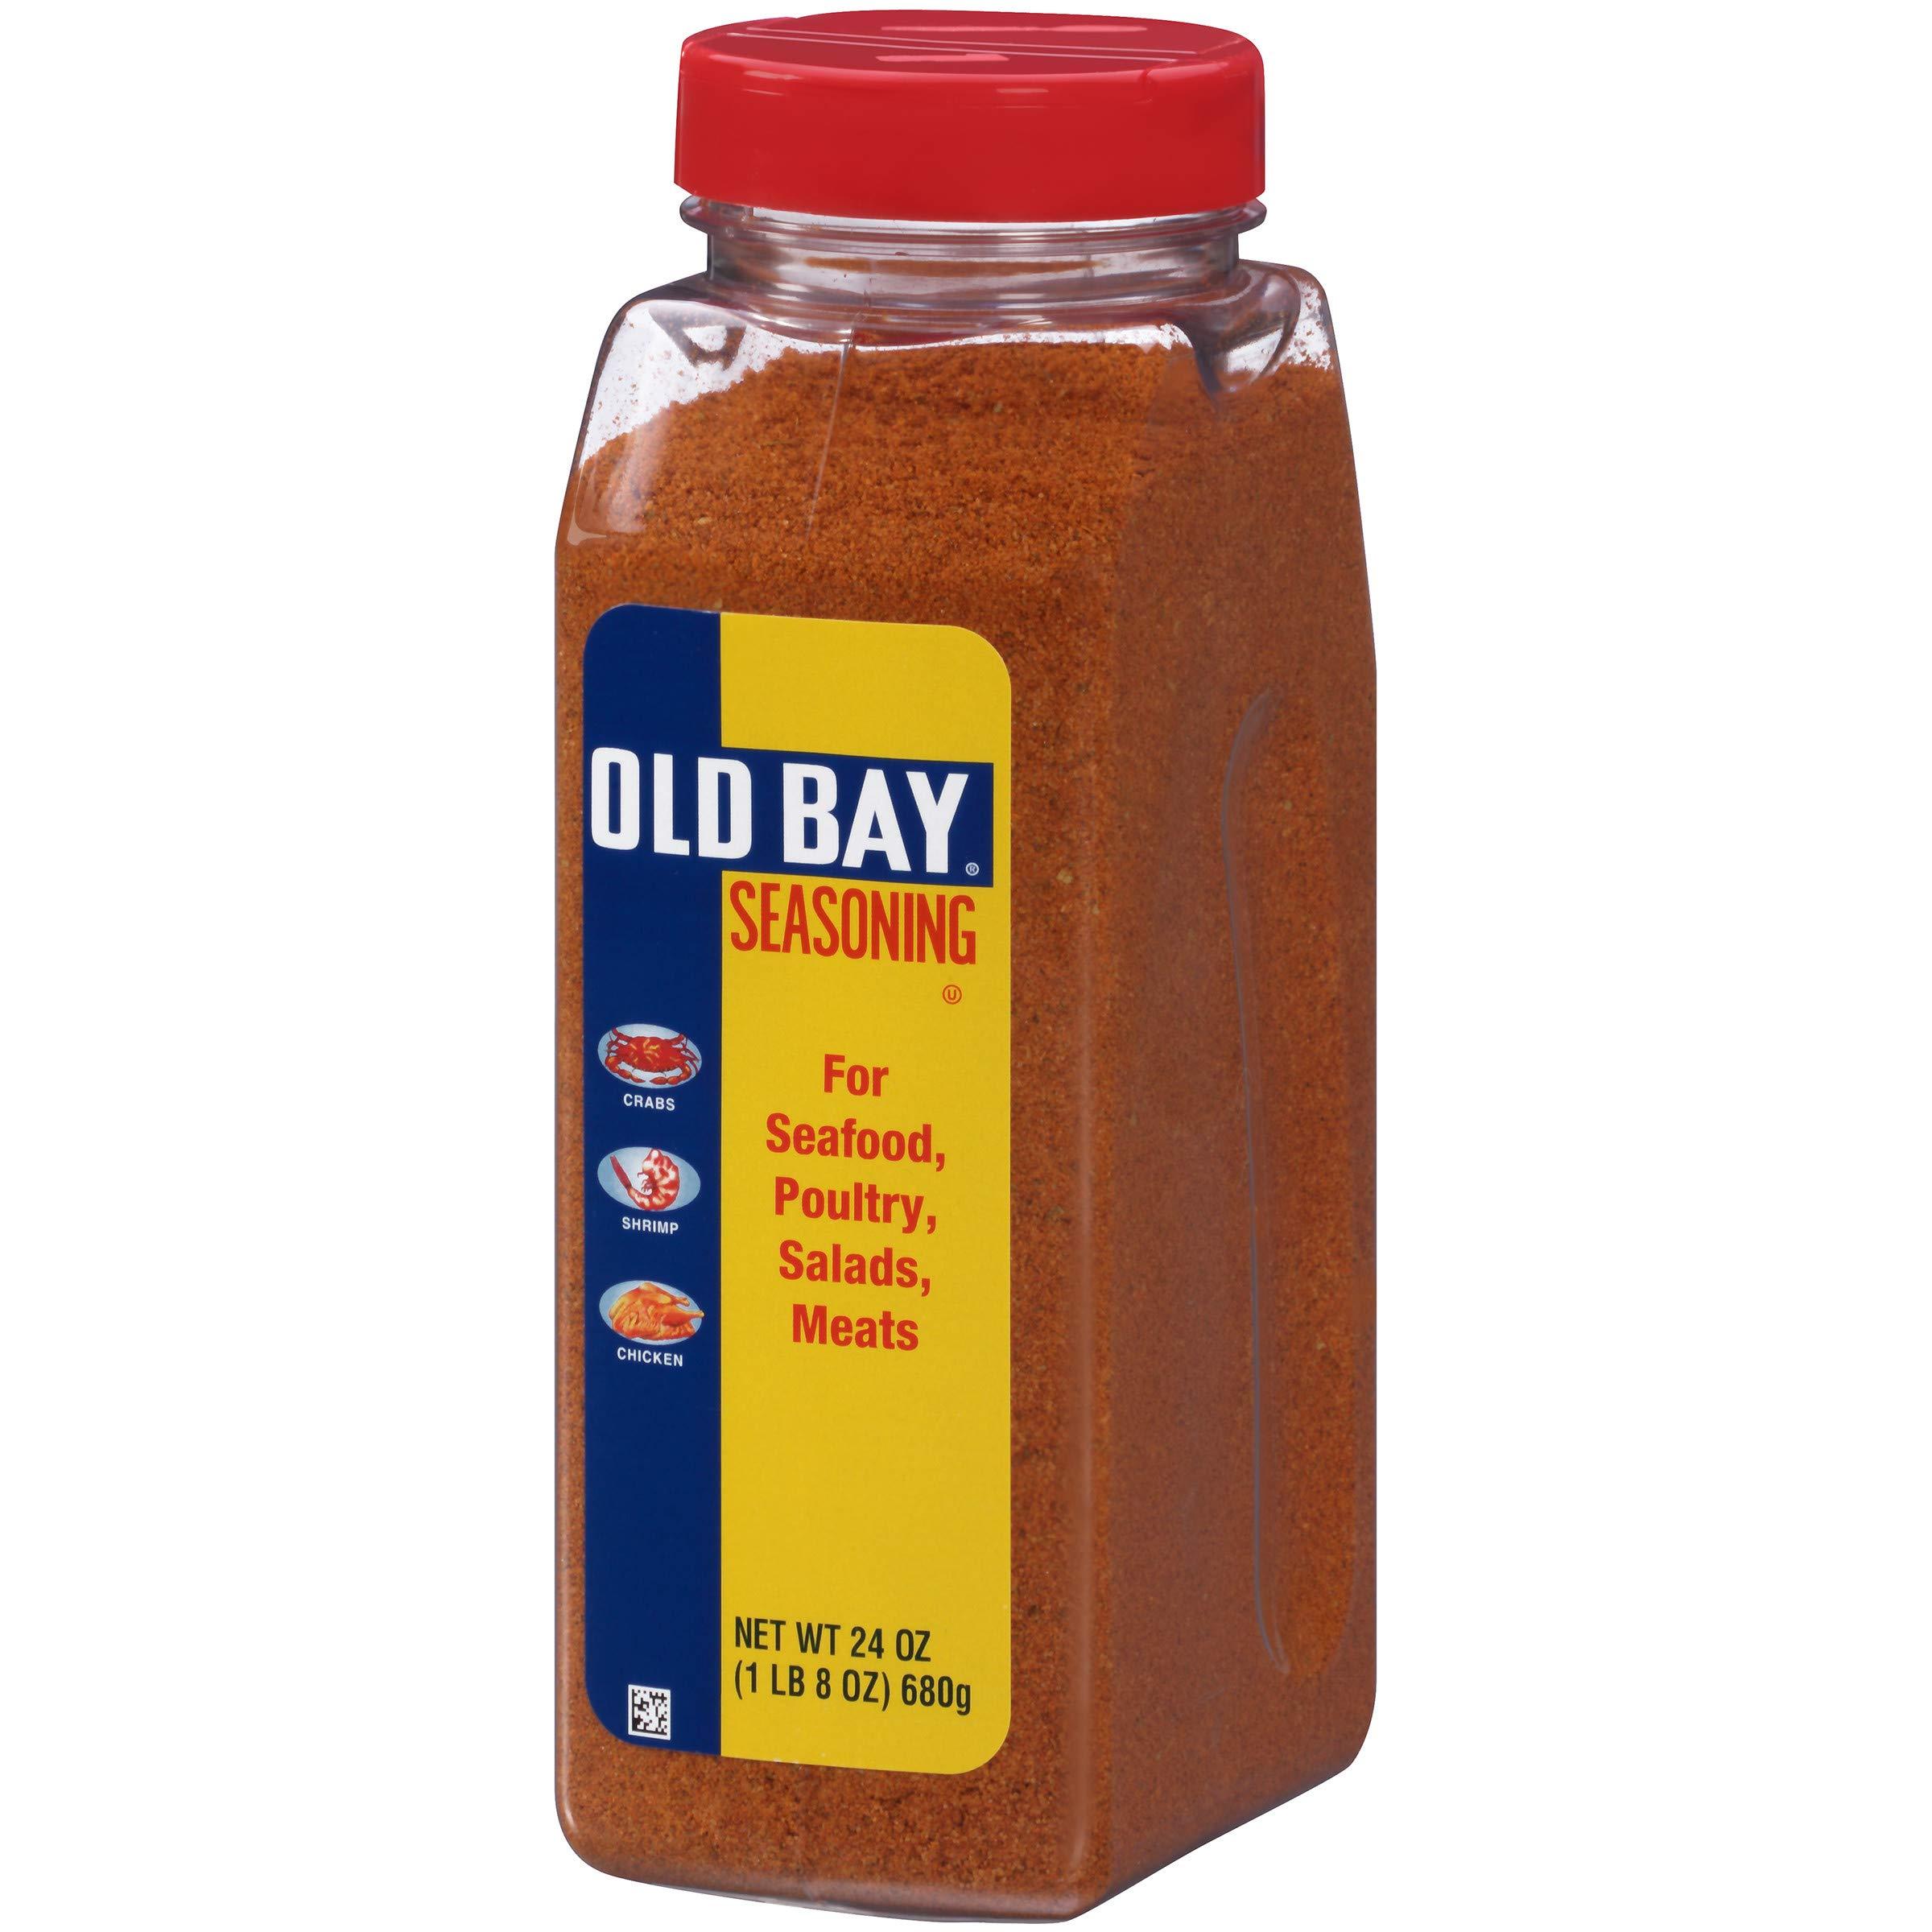 OLD BAY Seasoning, 24 oz by Old Bay